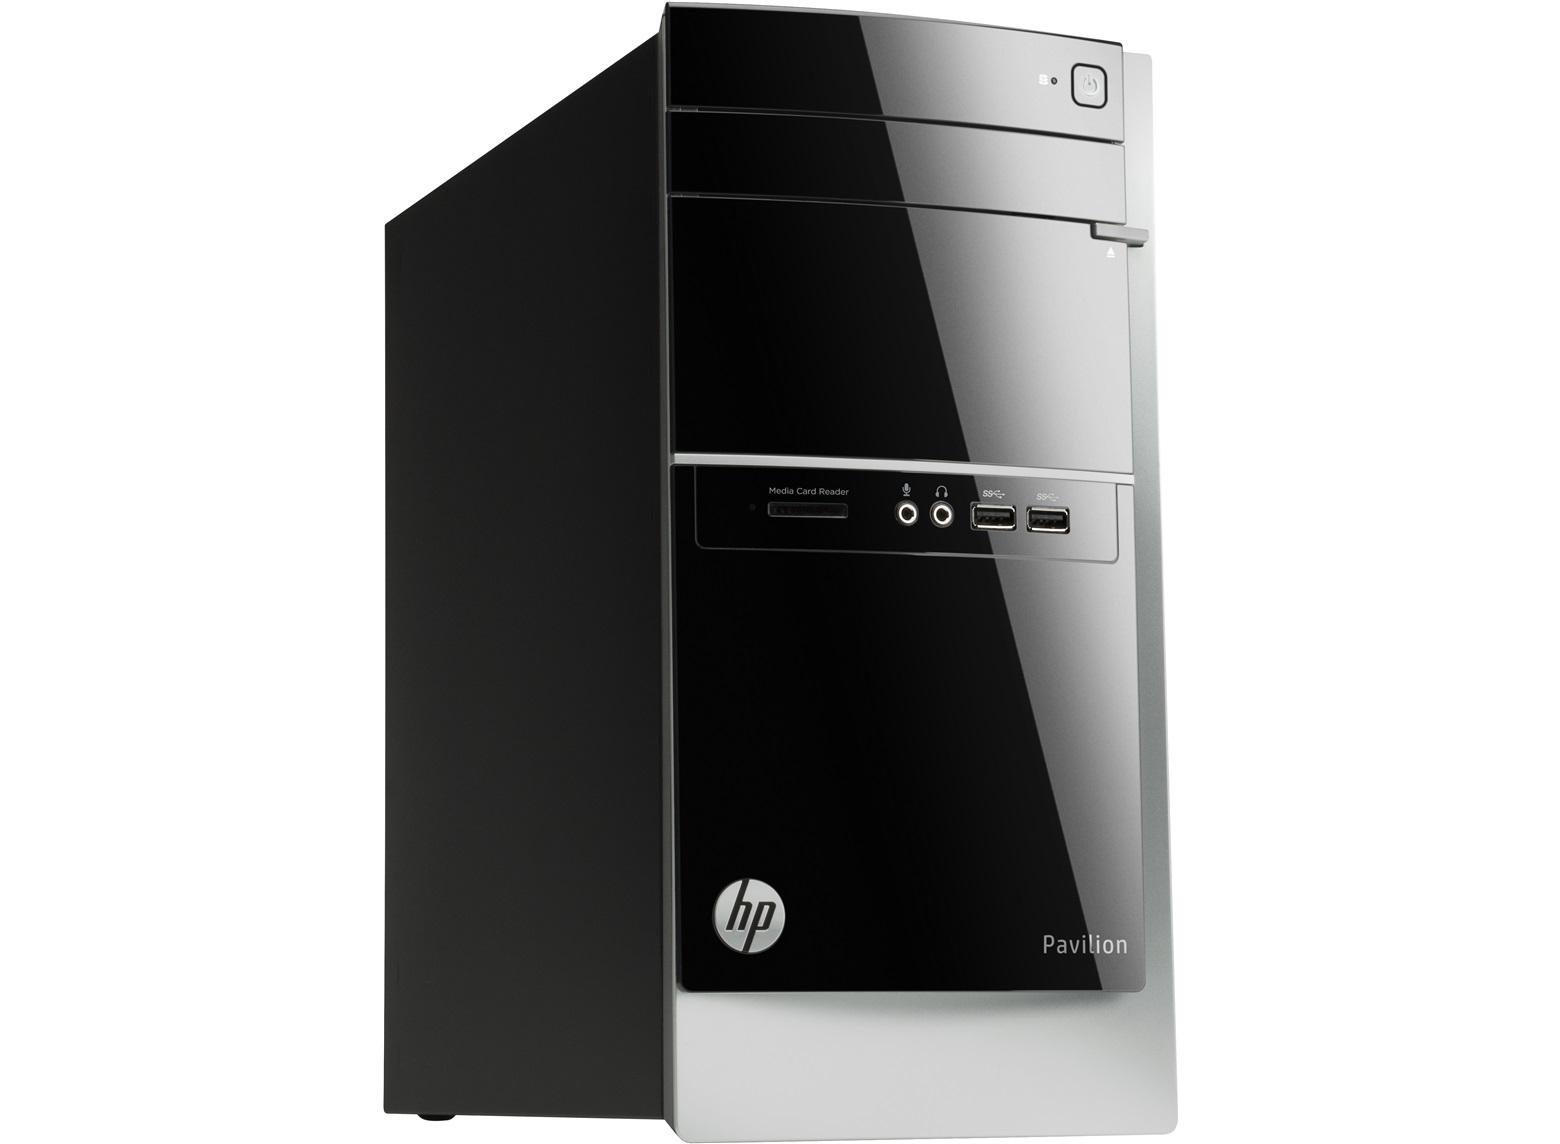 Máy bộ HP Pavilion 500-503x, Core i5-4460/4GB/1TB (K5M23AA)